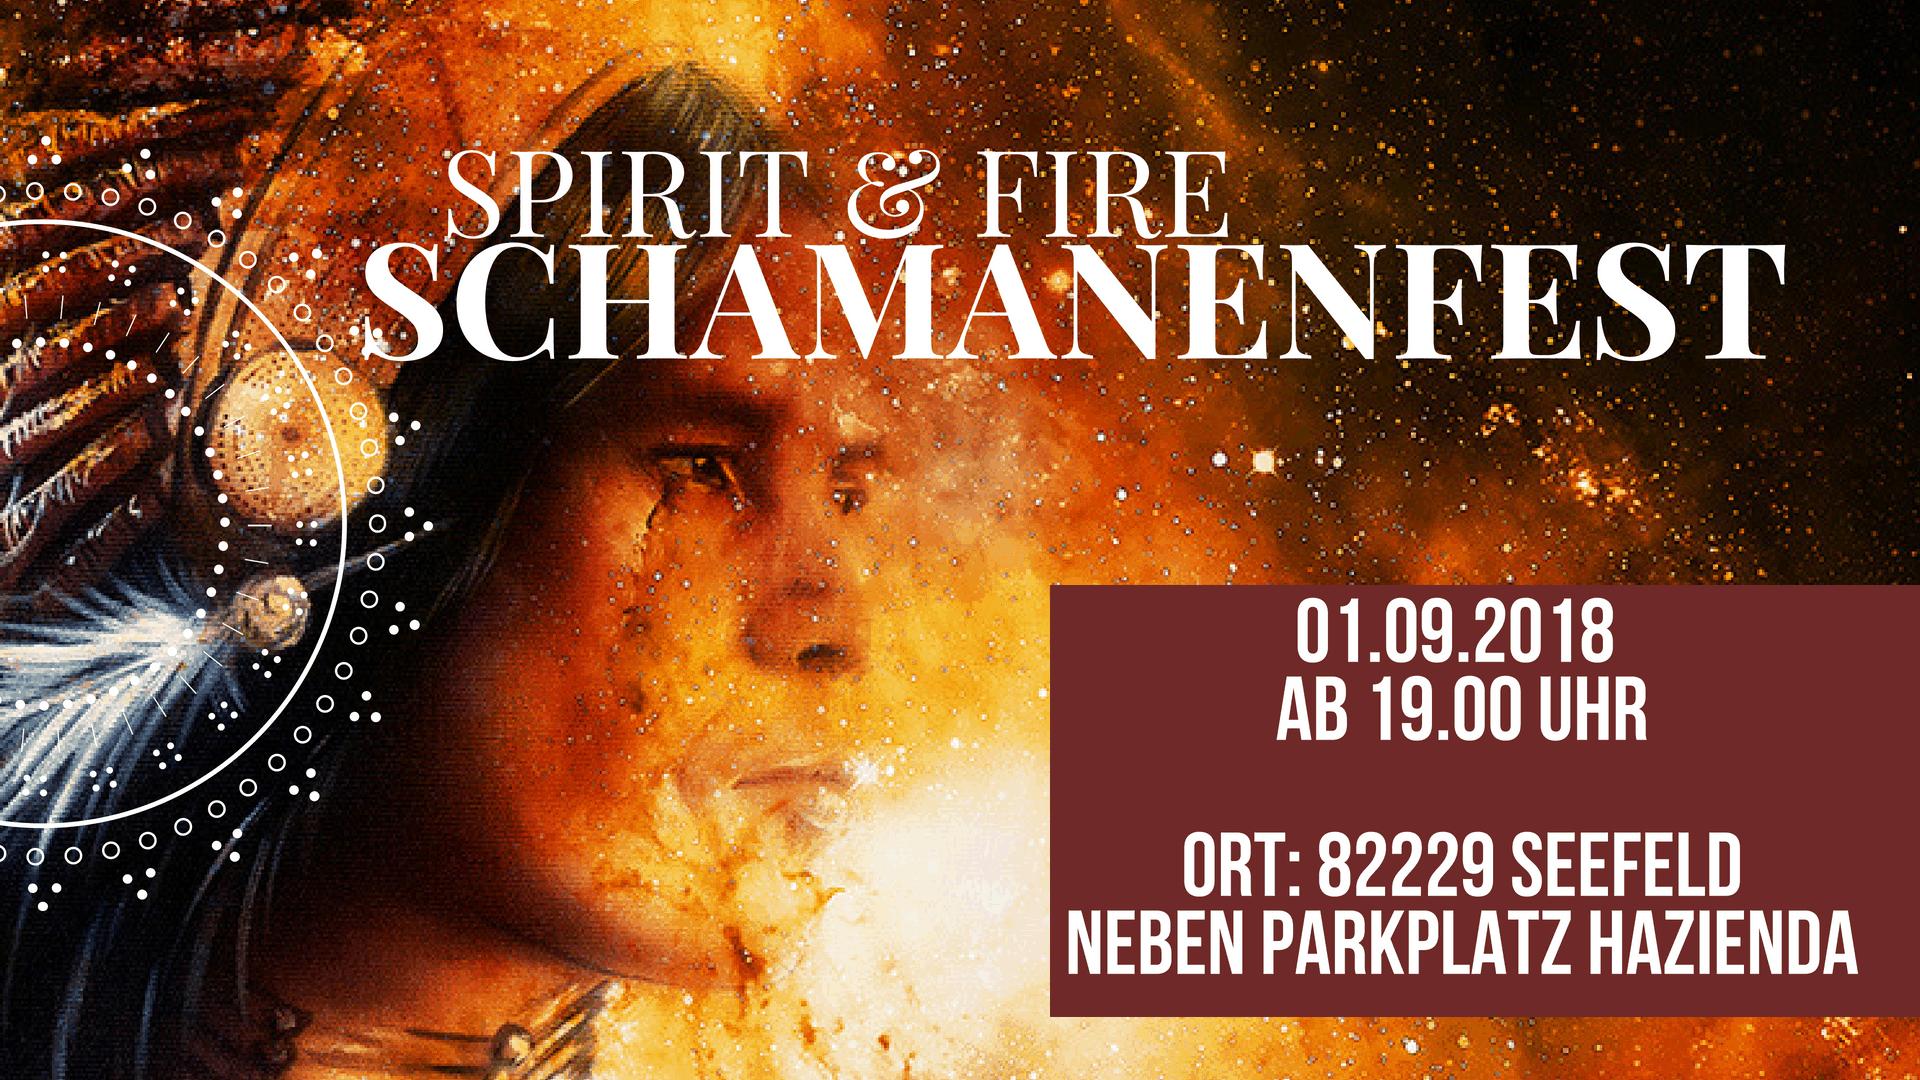 HEILER & SCHAMANENFEST SPIRIT & FIRE beim Ammersee am 01.09.2018